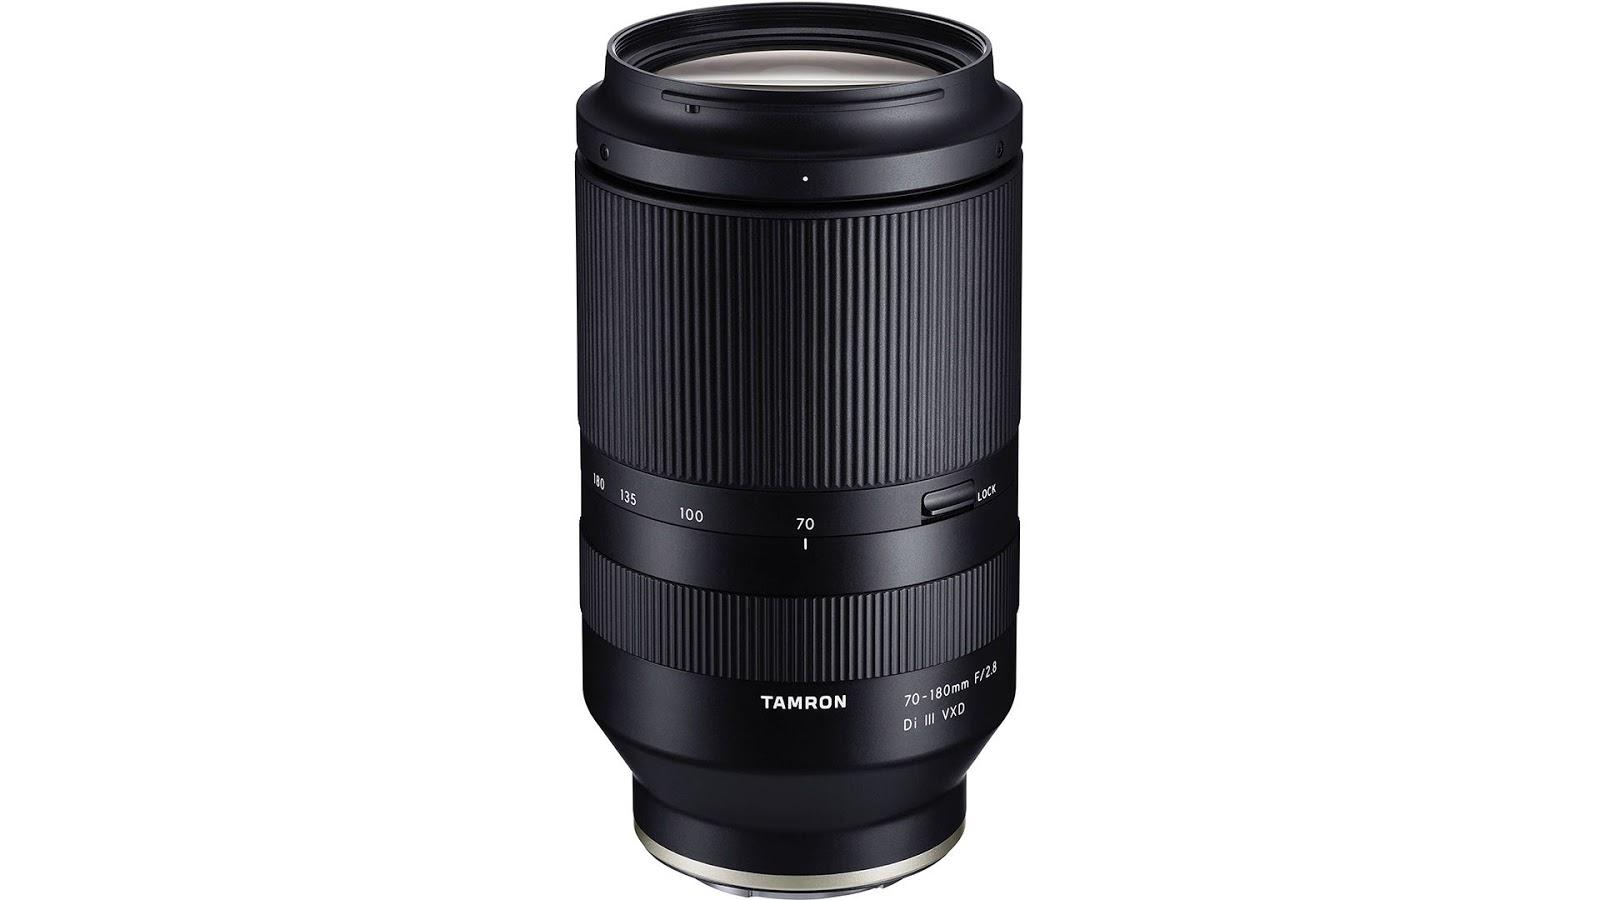 Tamron 70-180mm f/2.8 Di III VXD (A056)